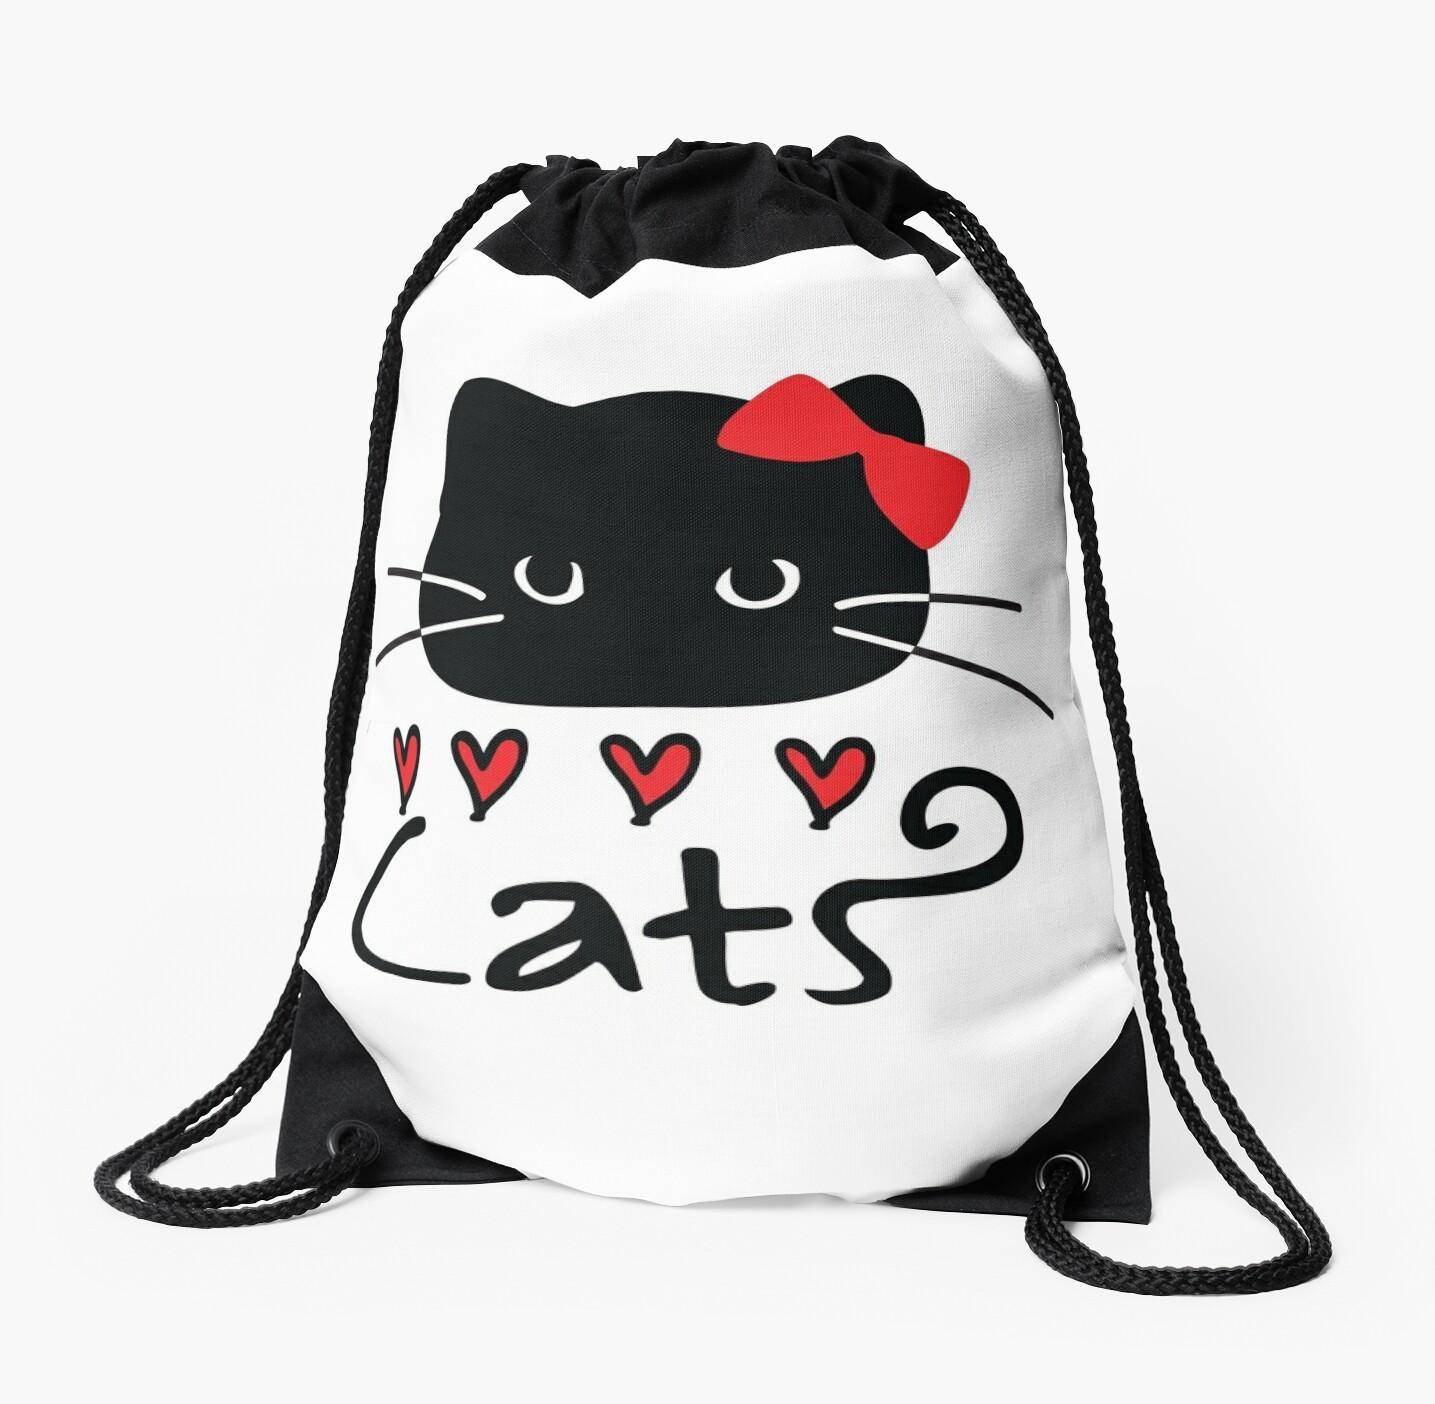 Love Cats by cheeckymonkey